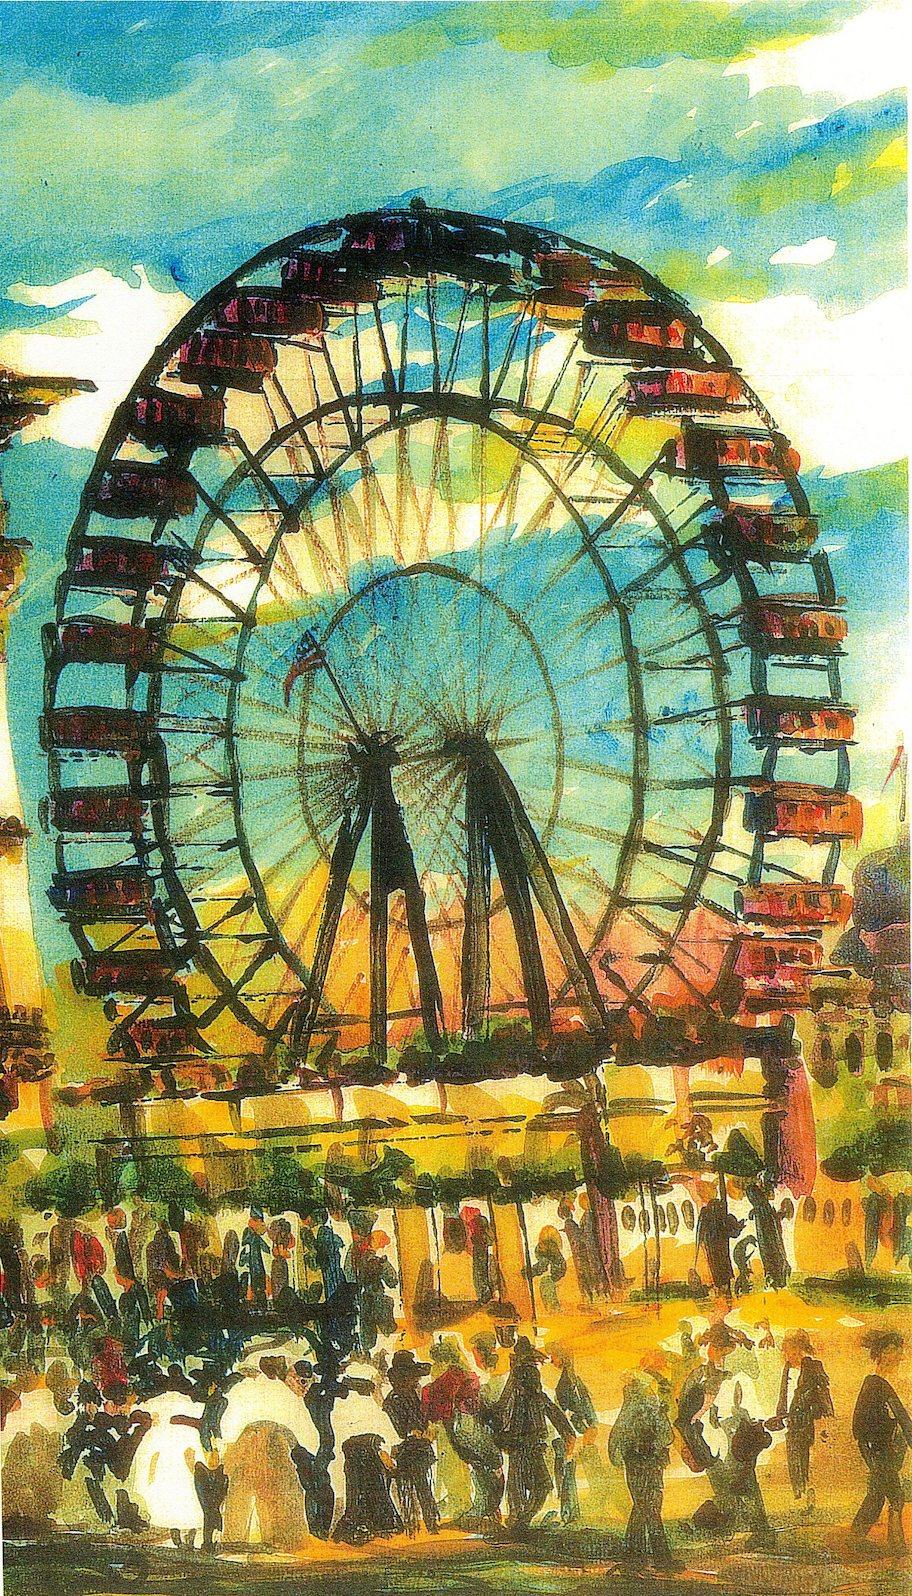 714 ferris wheel 2